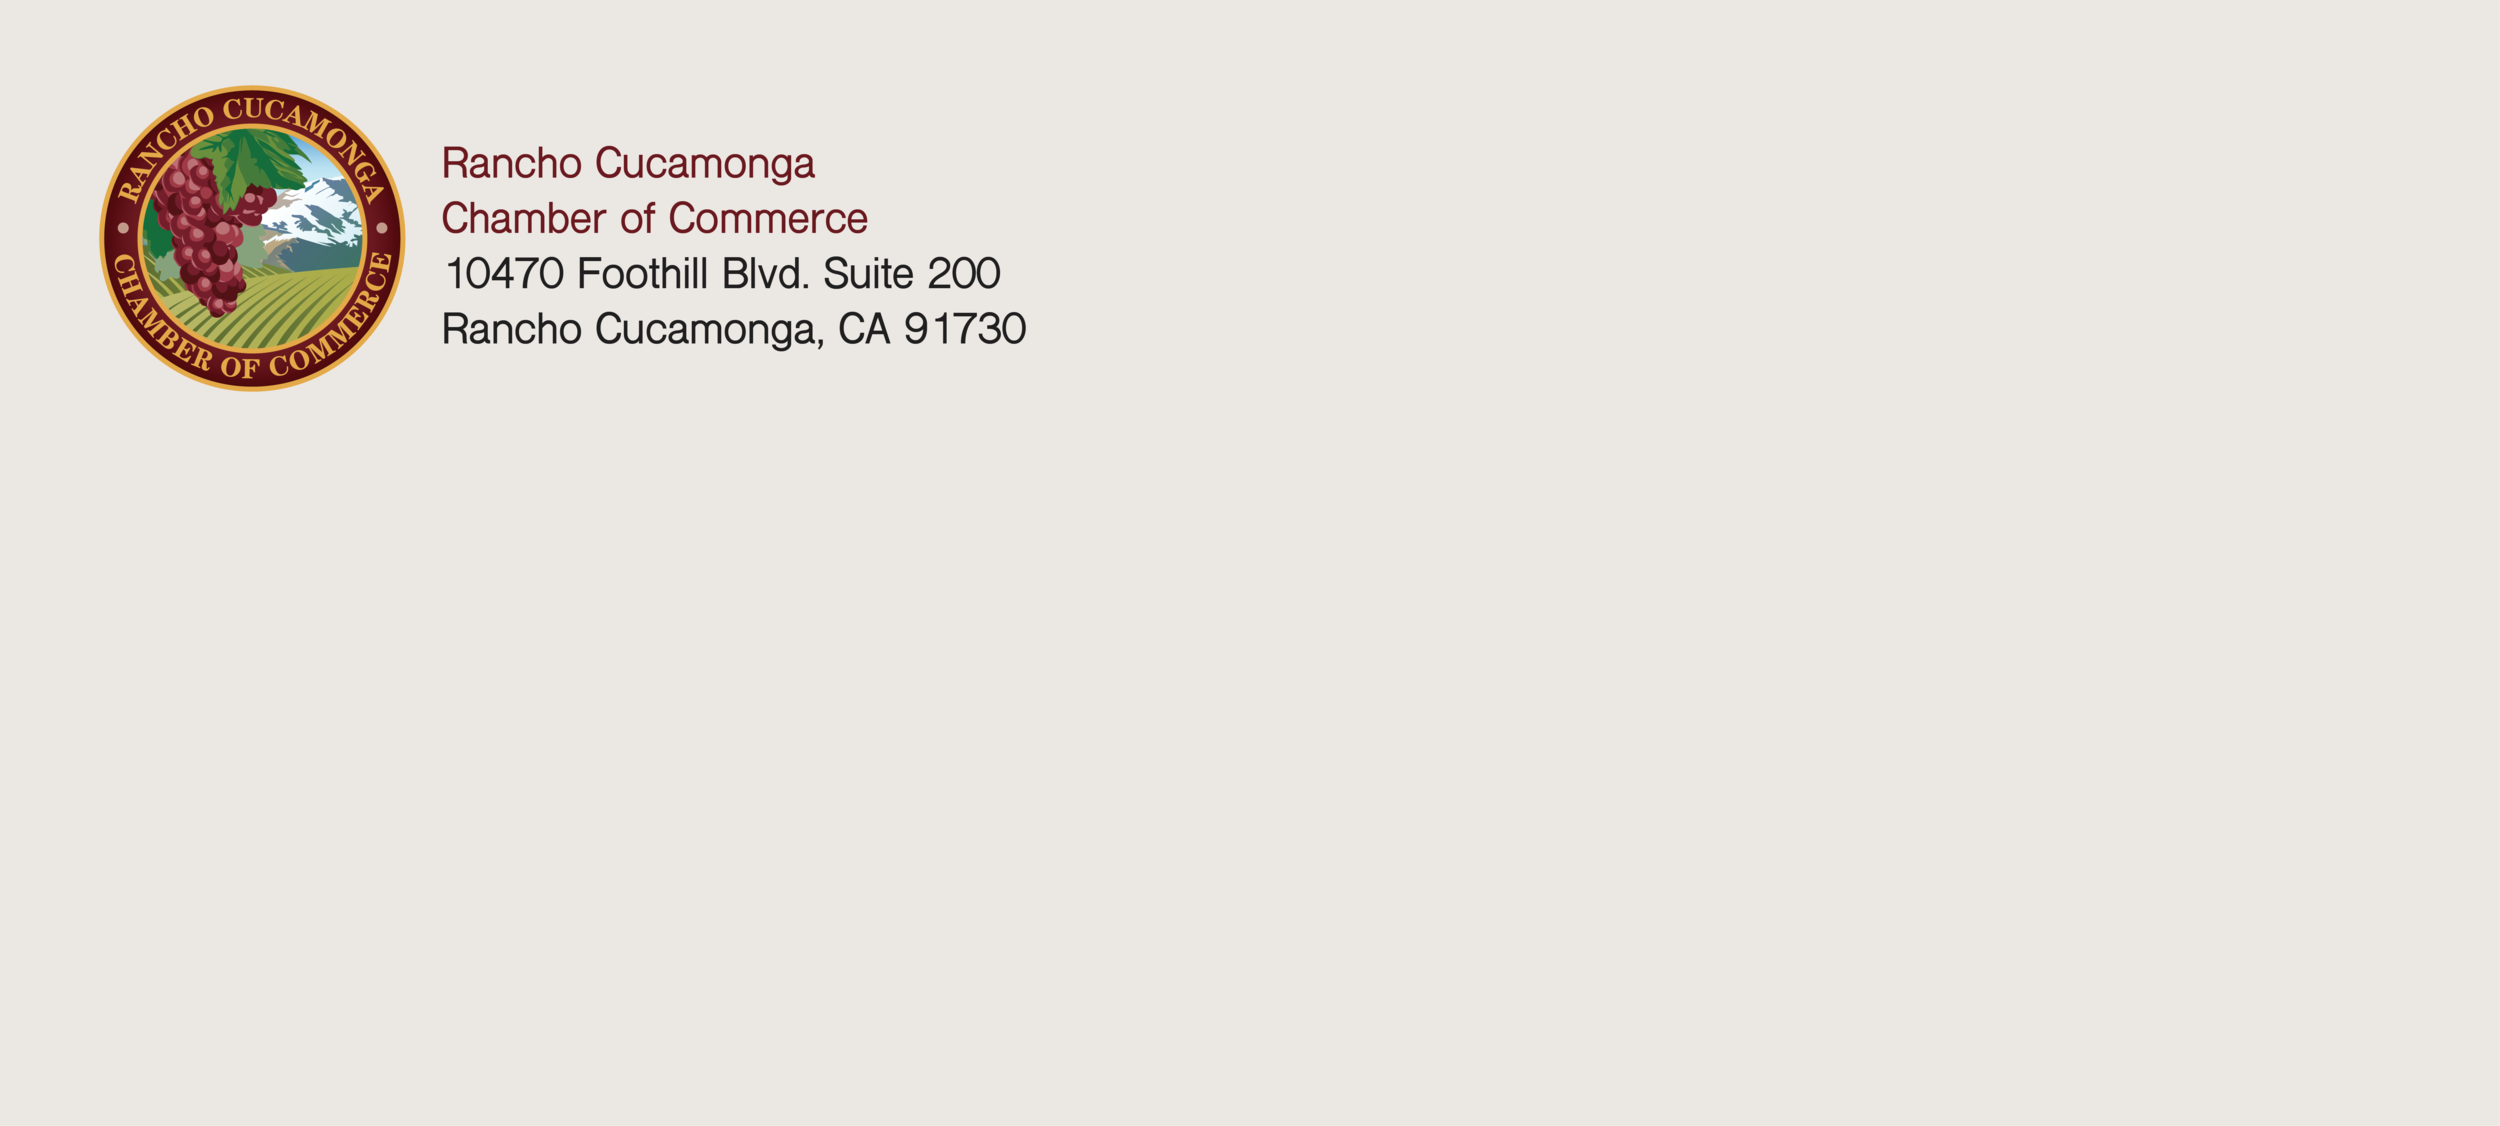 Rancho Cucamonga Chamber of Commerce Envelope